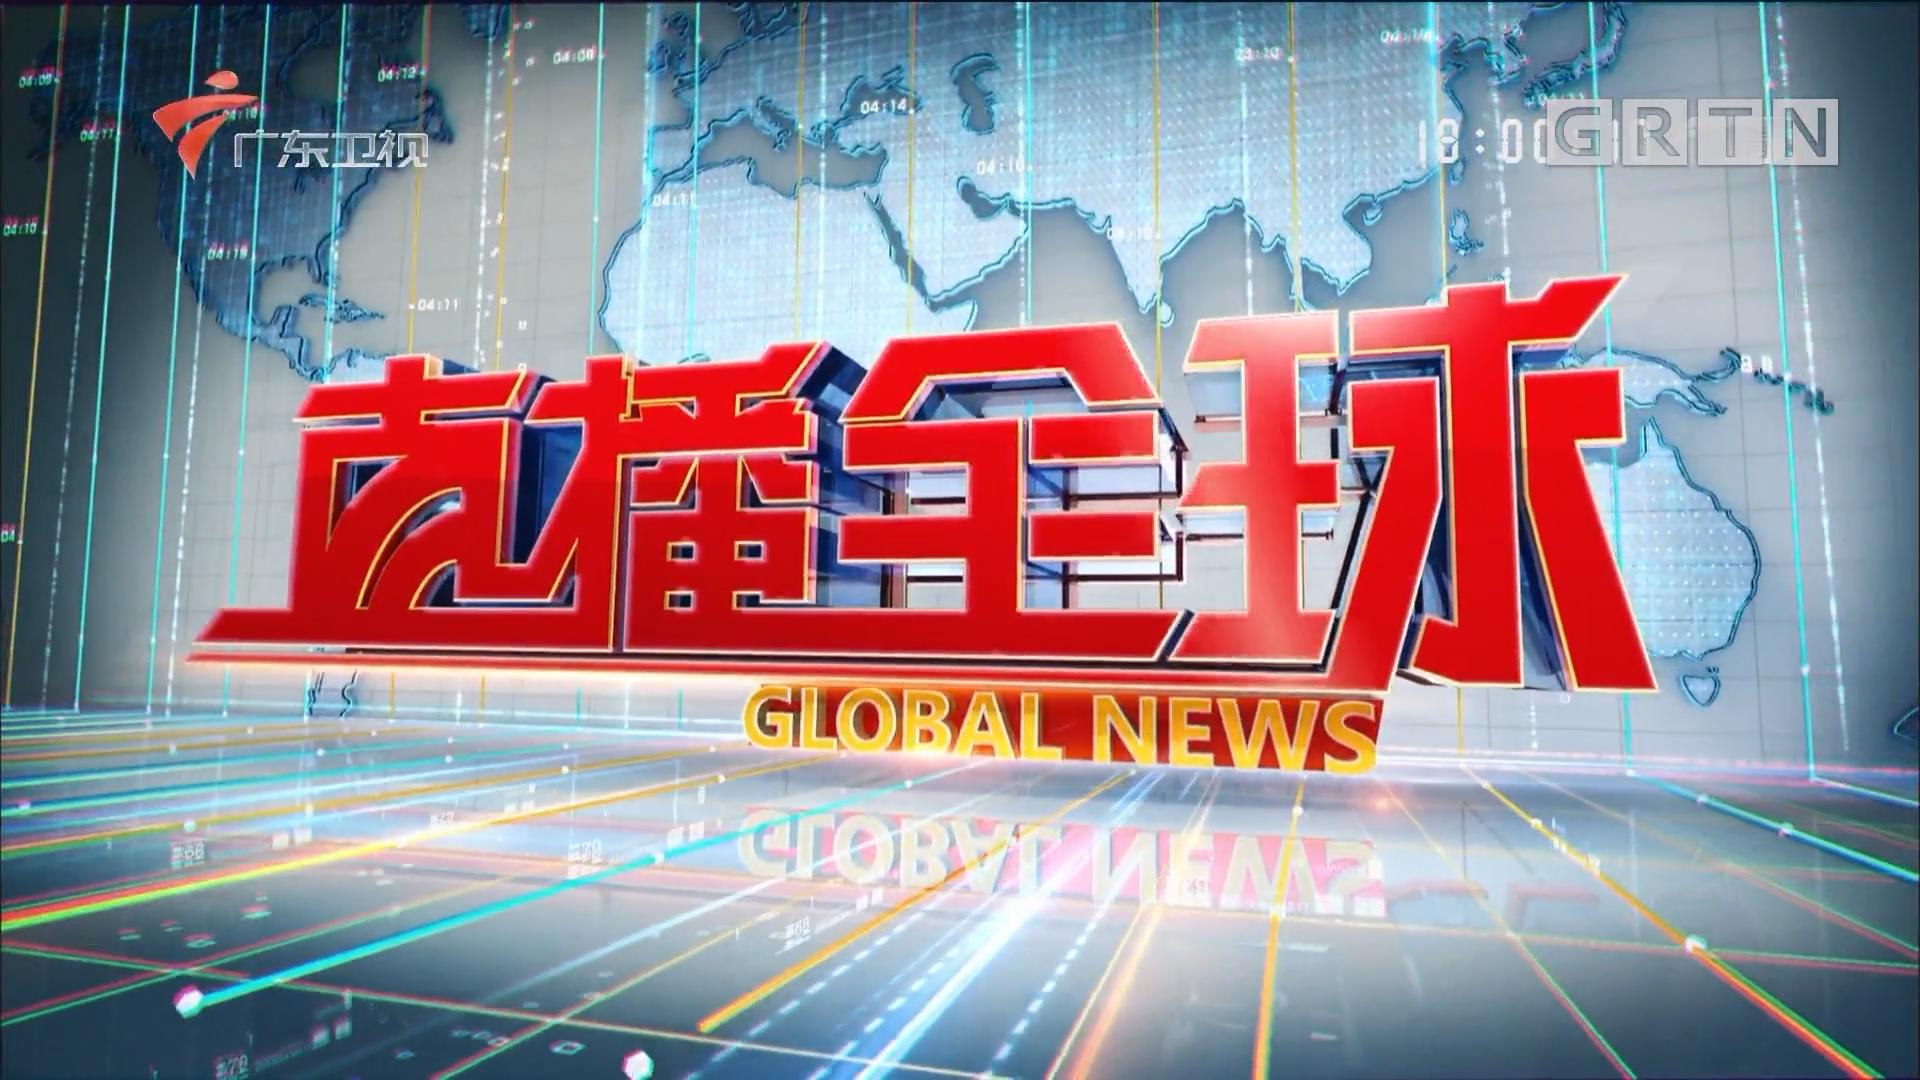 [HD][2018-10-17]直播全球:美财政部宣布对伊朗实施新一轮制裁:制裁主要对象为金融机构和制造业